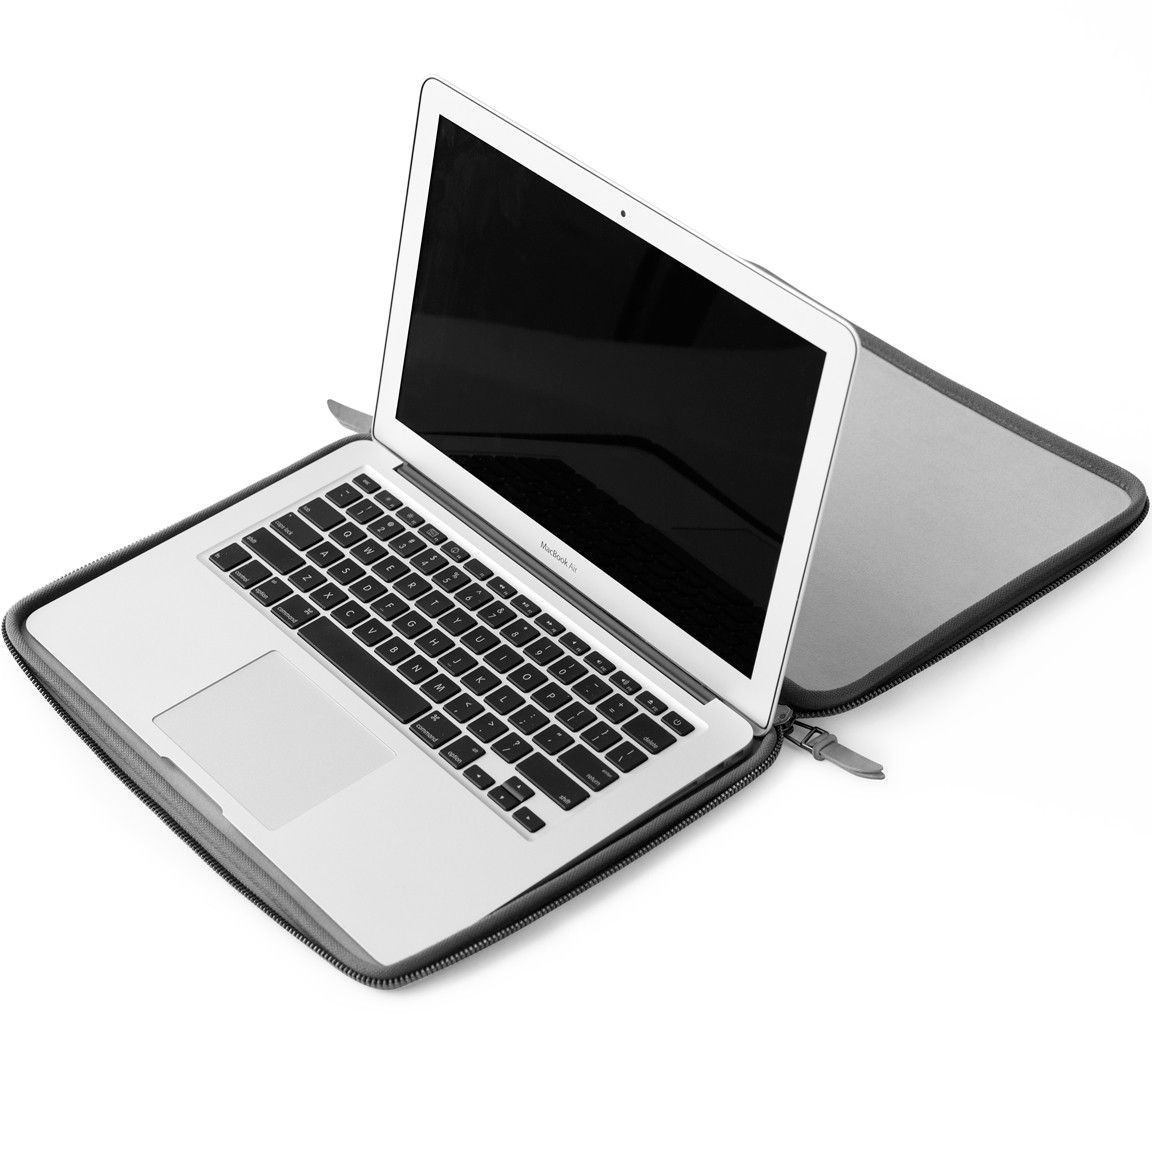 "Laptop Case 15"" | Navy"